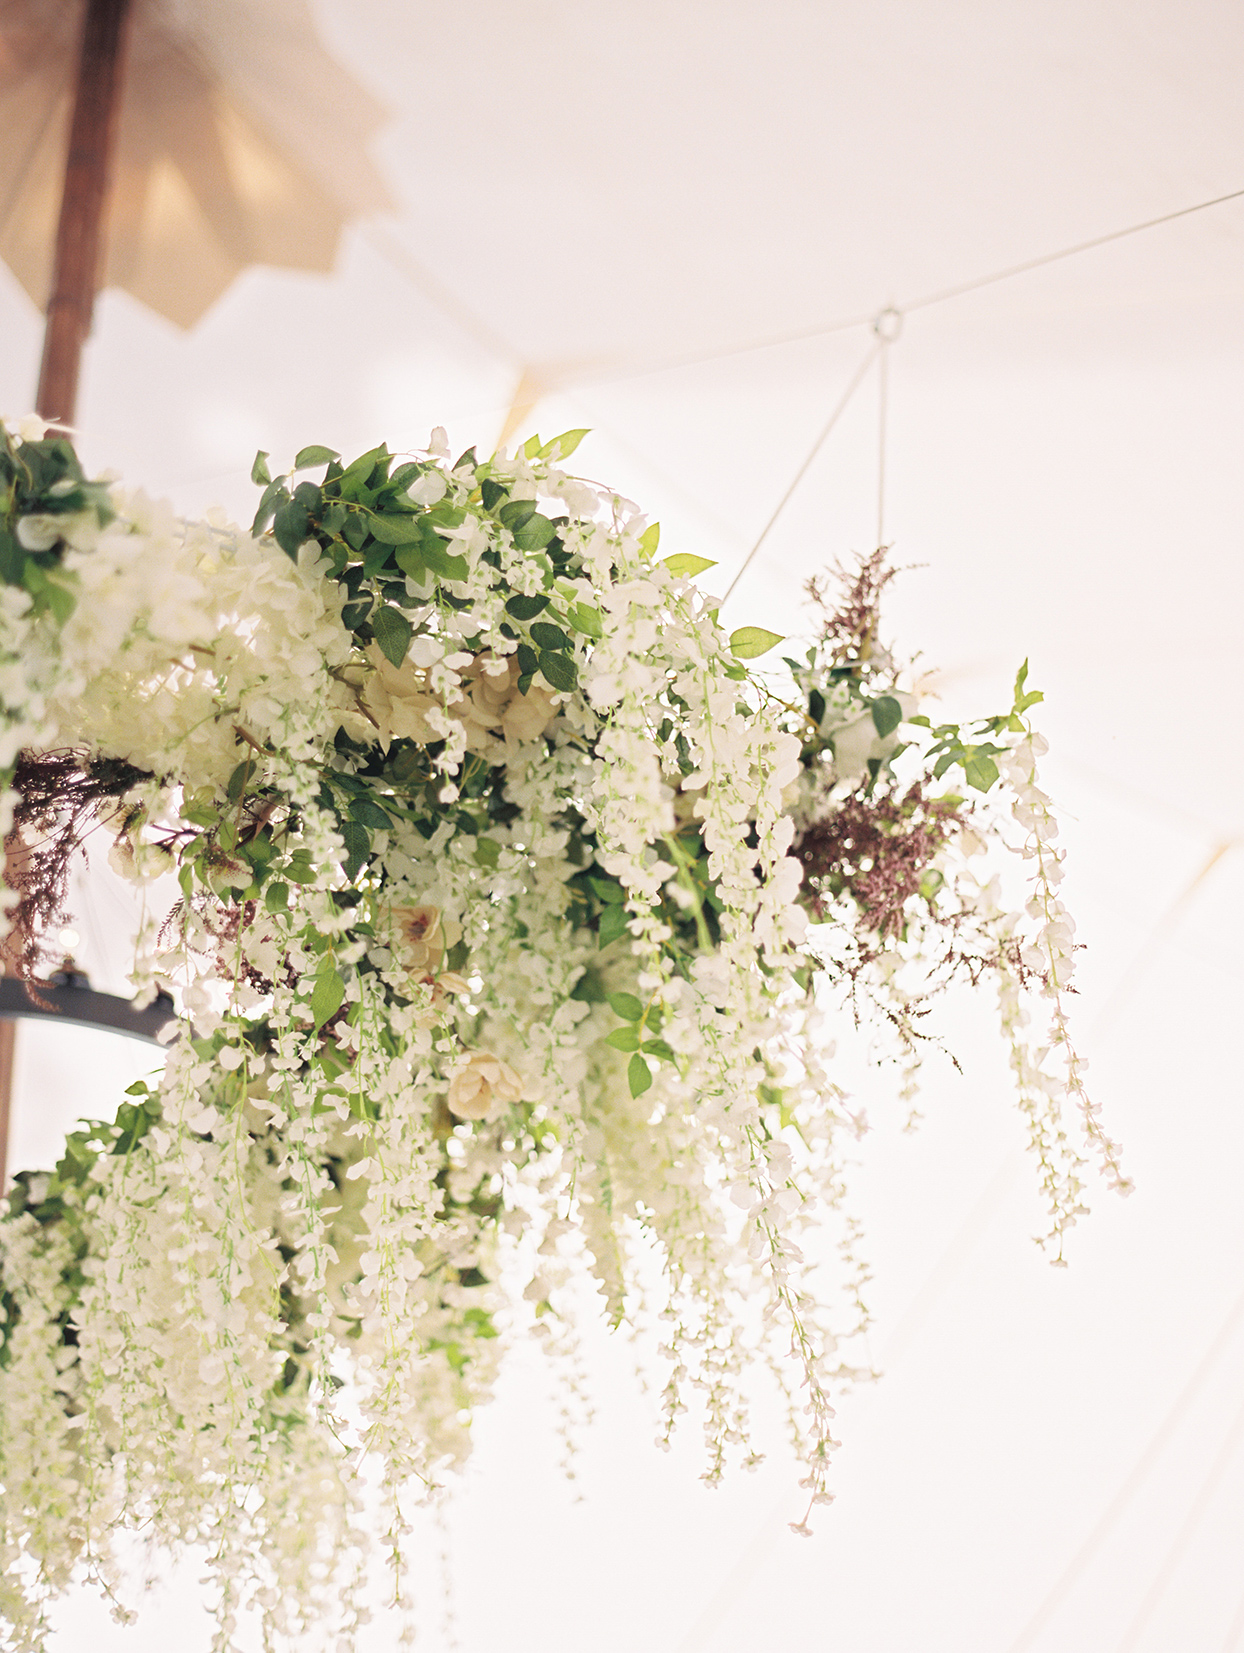 hanging floral chandelier at wedding reception